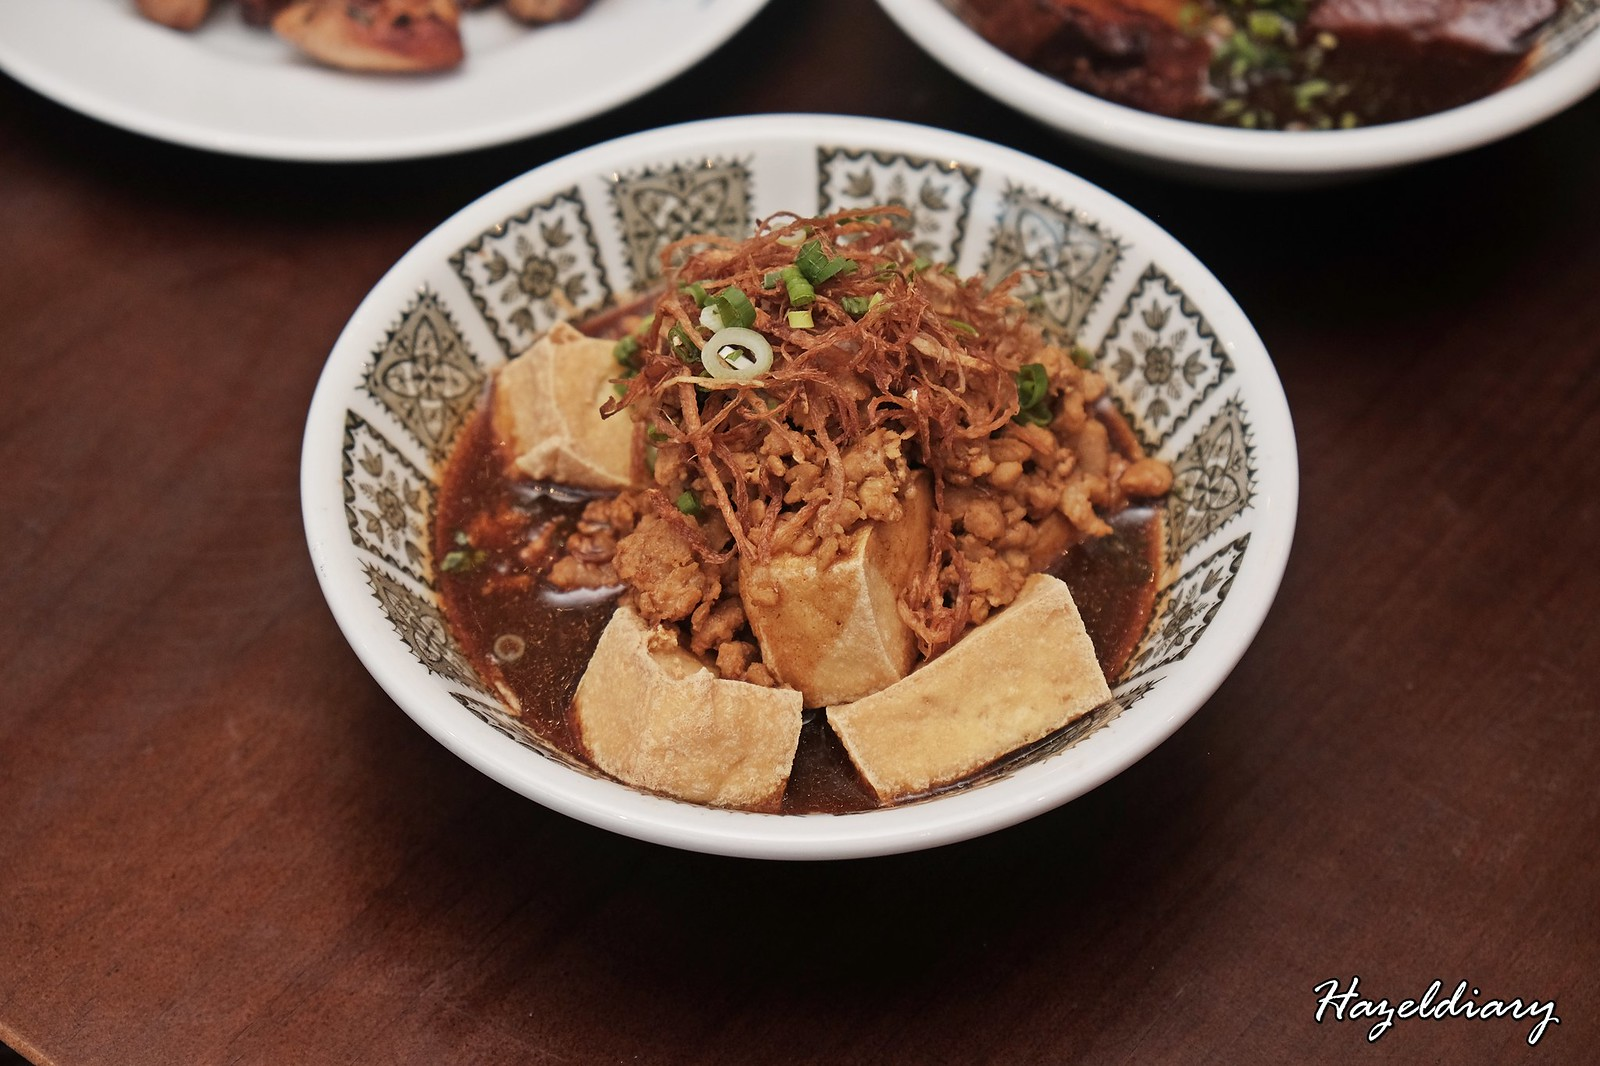 The Salted Plum Circular Road-Tau Kwa Century Egg Minced Pork